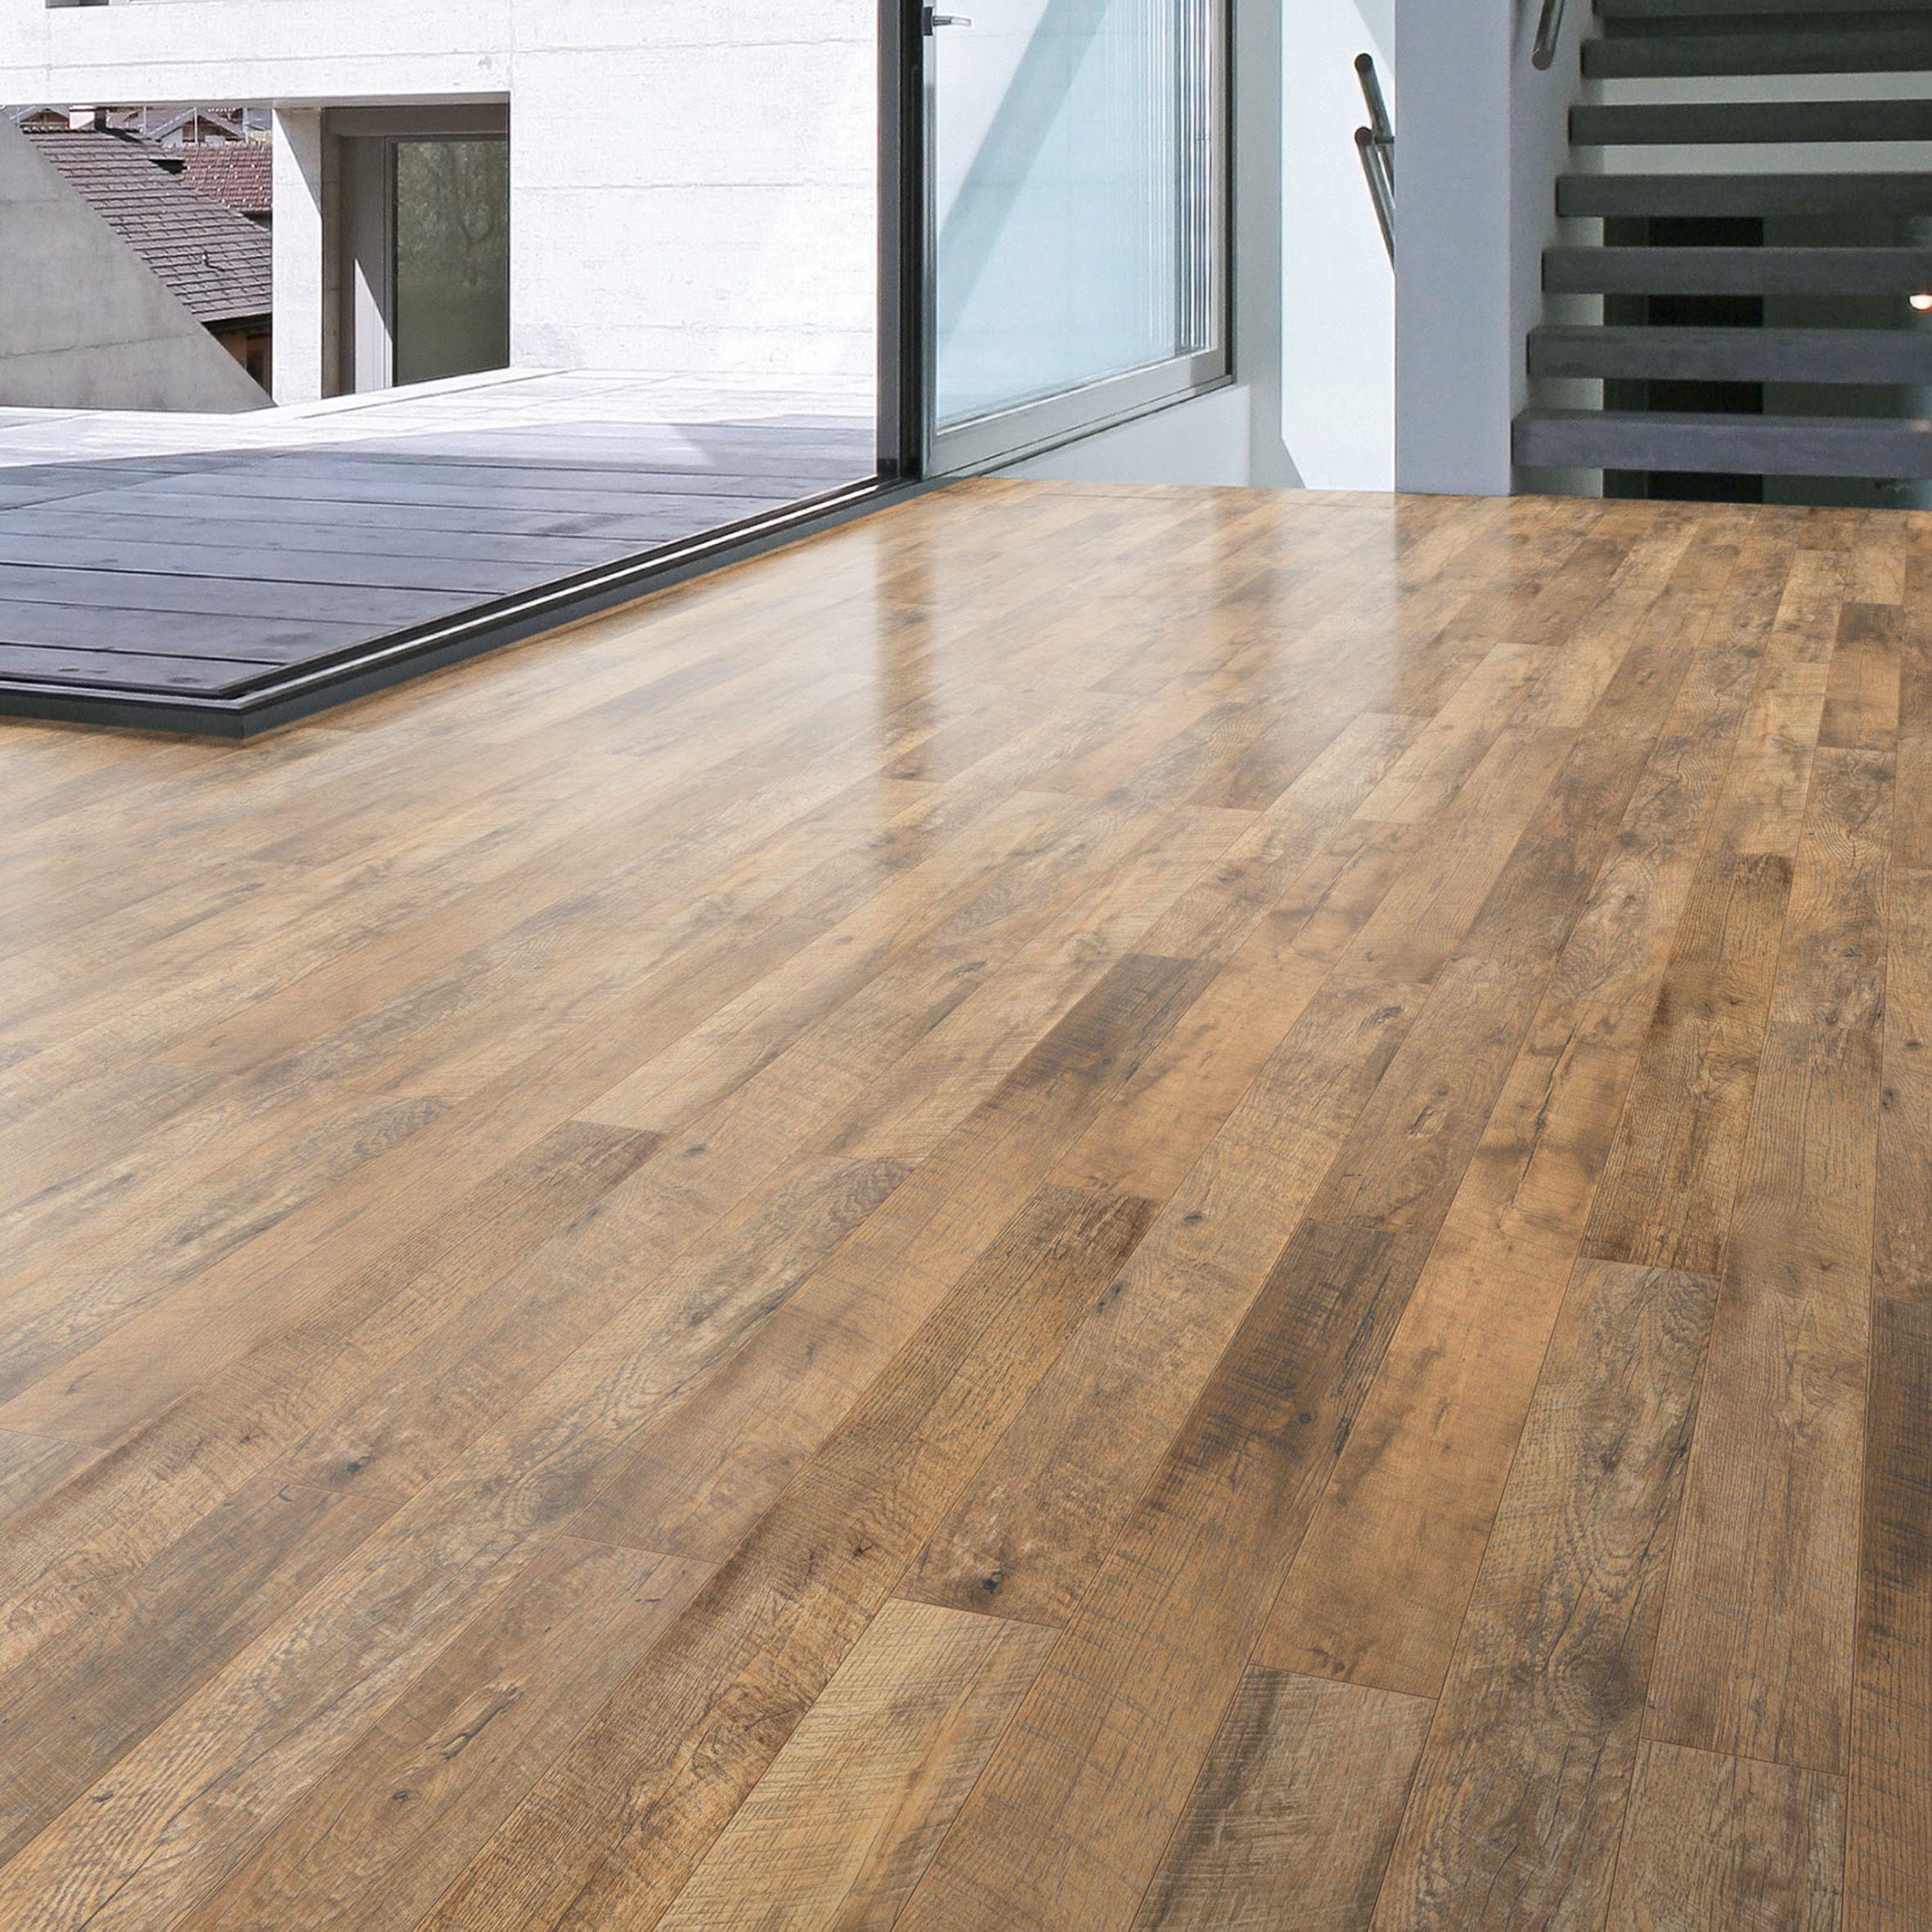 Guarcino Reclaimed Oak Effect Laminate Flooring 1.64 m²